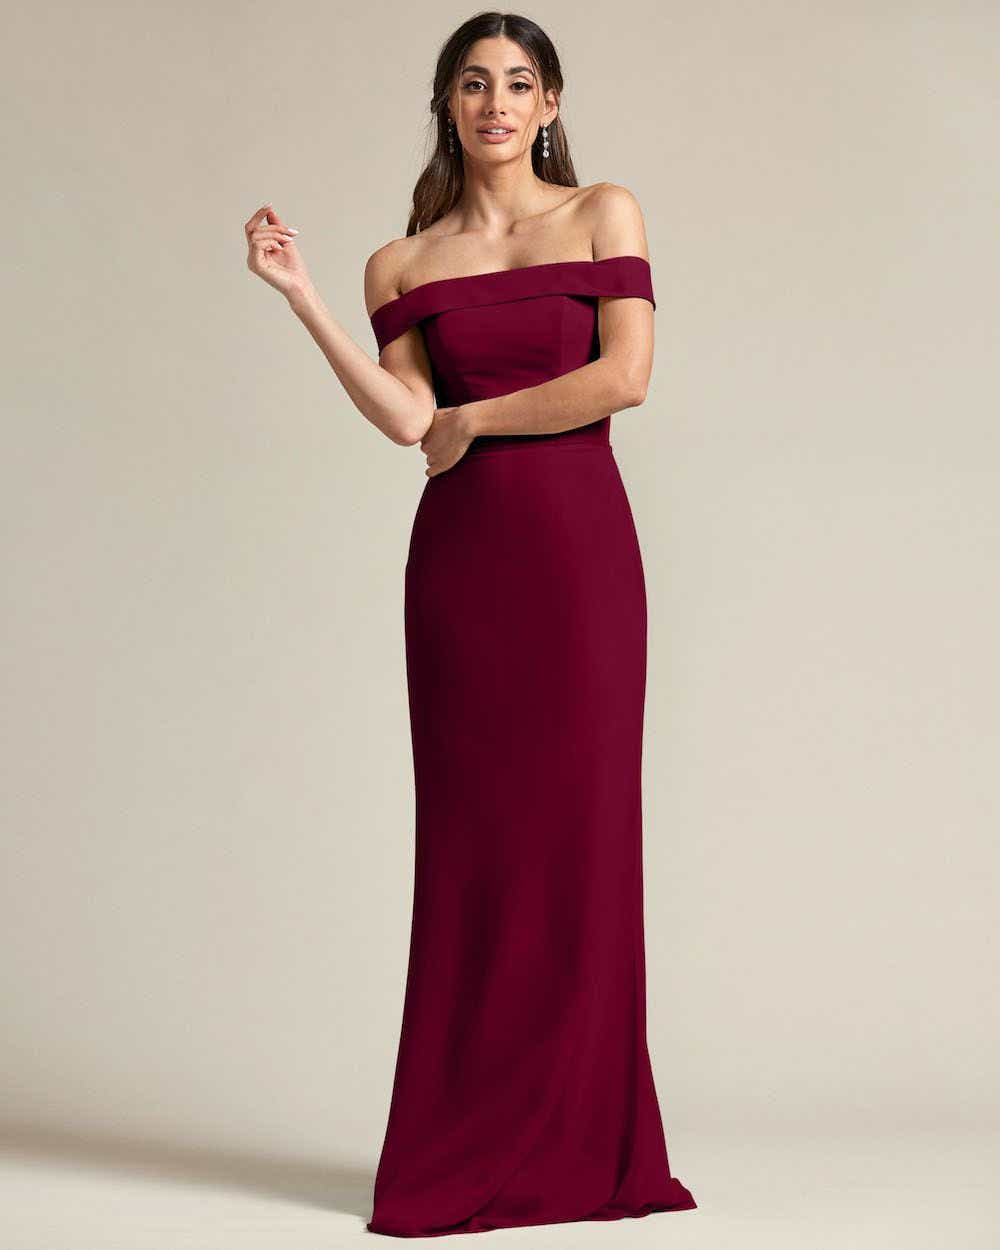 Over The Shoulder Classic Princess Maxi Dress - Front